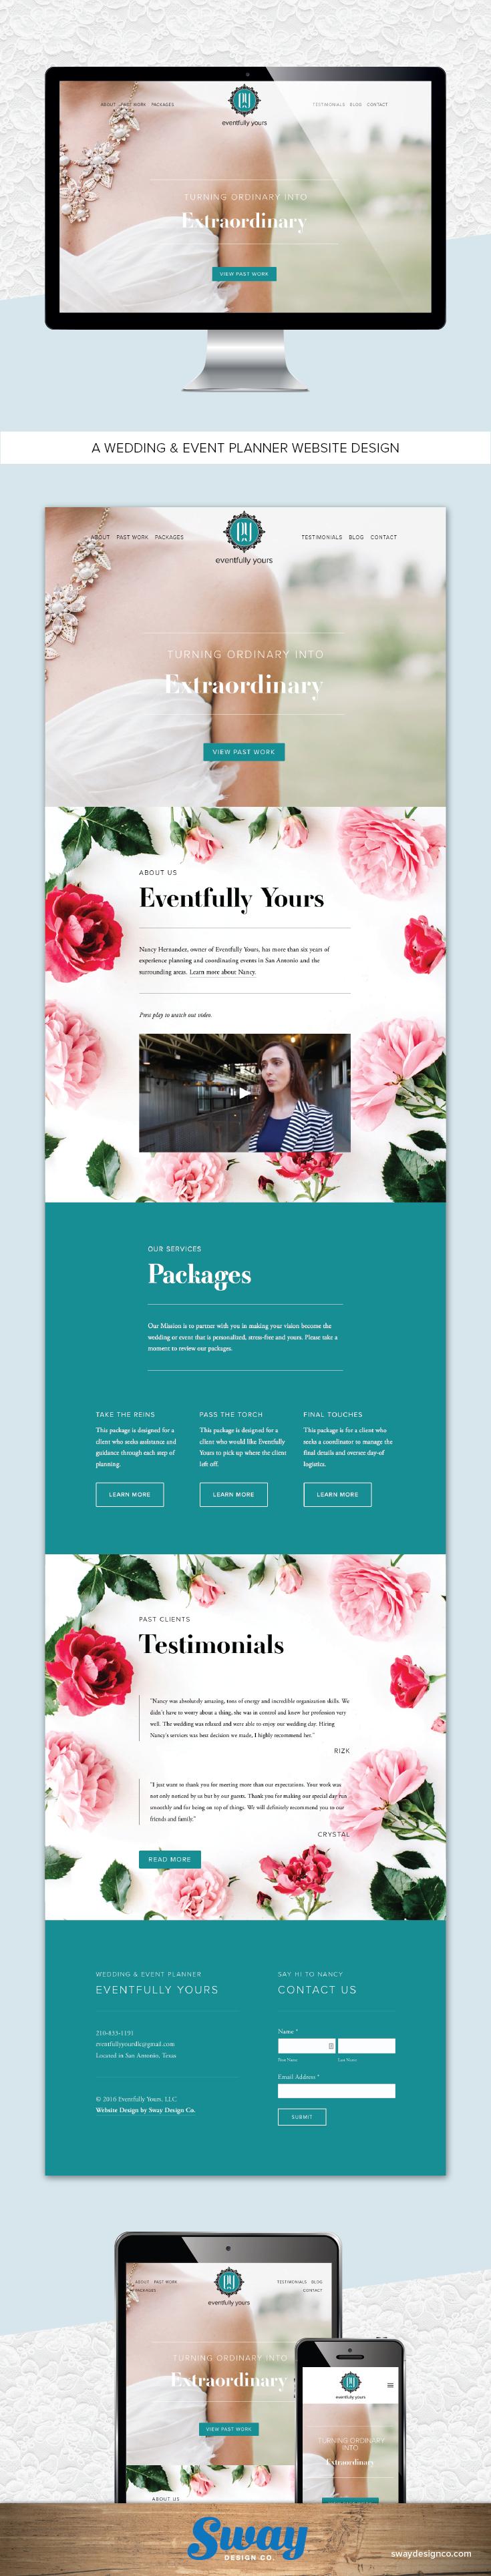 Eventfully Yours Wedding Planner Website Design Sway Design Co